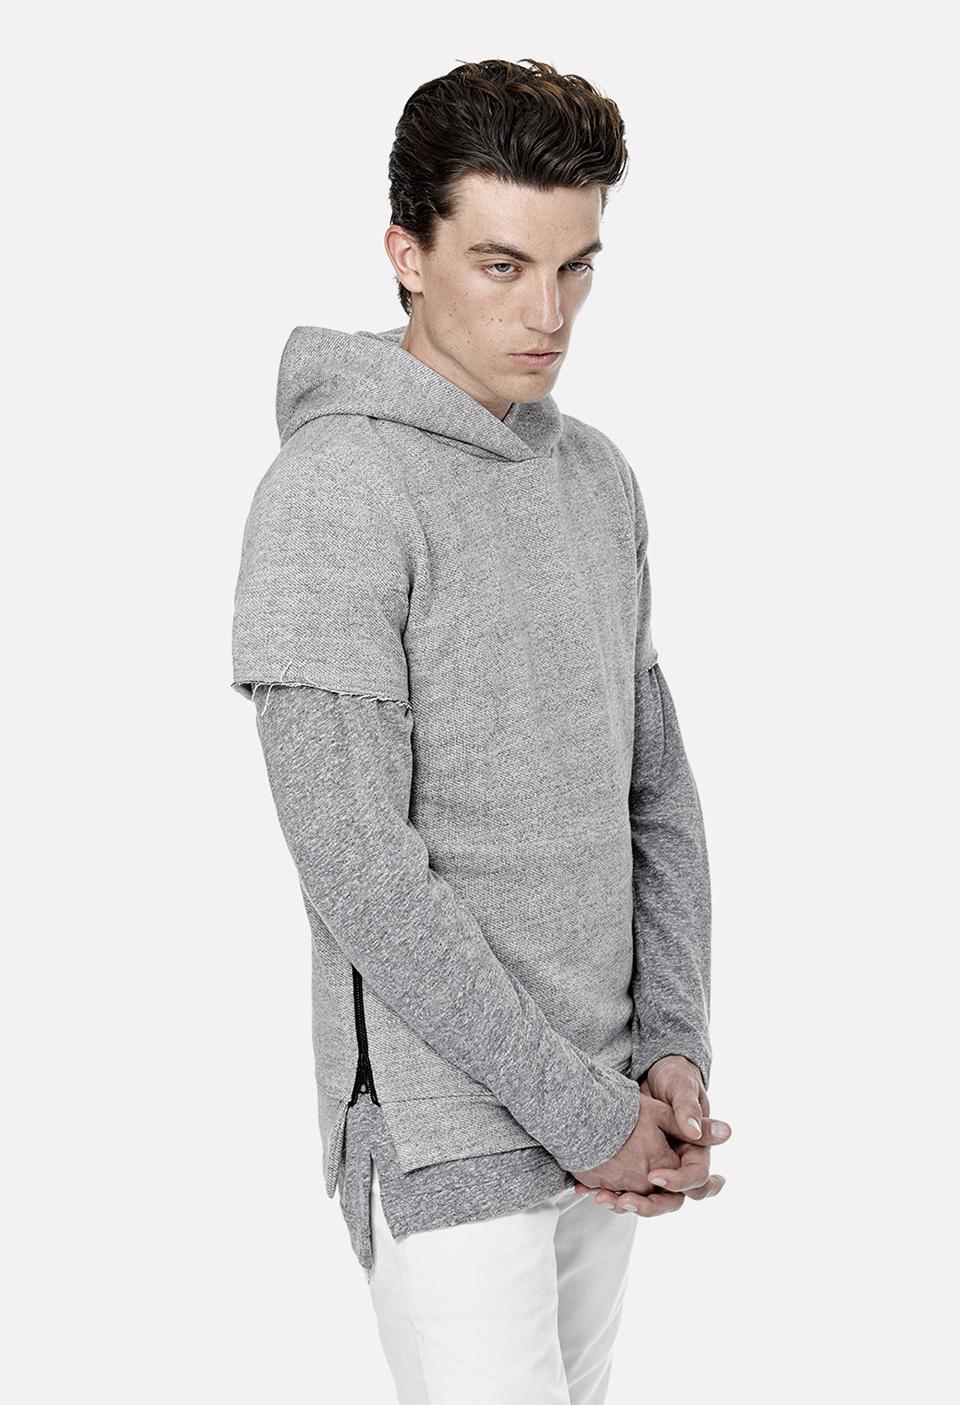 John Elliott Villain Sweatshirts The Awesomer